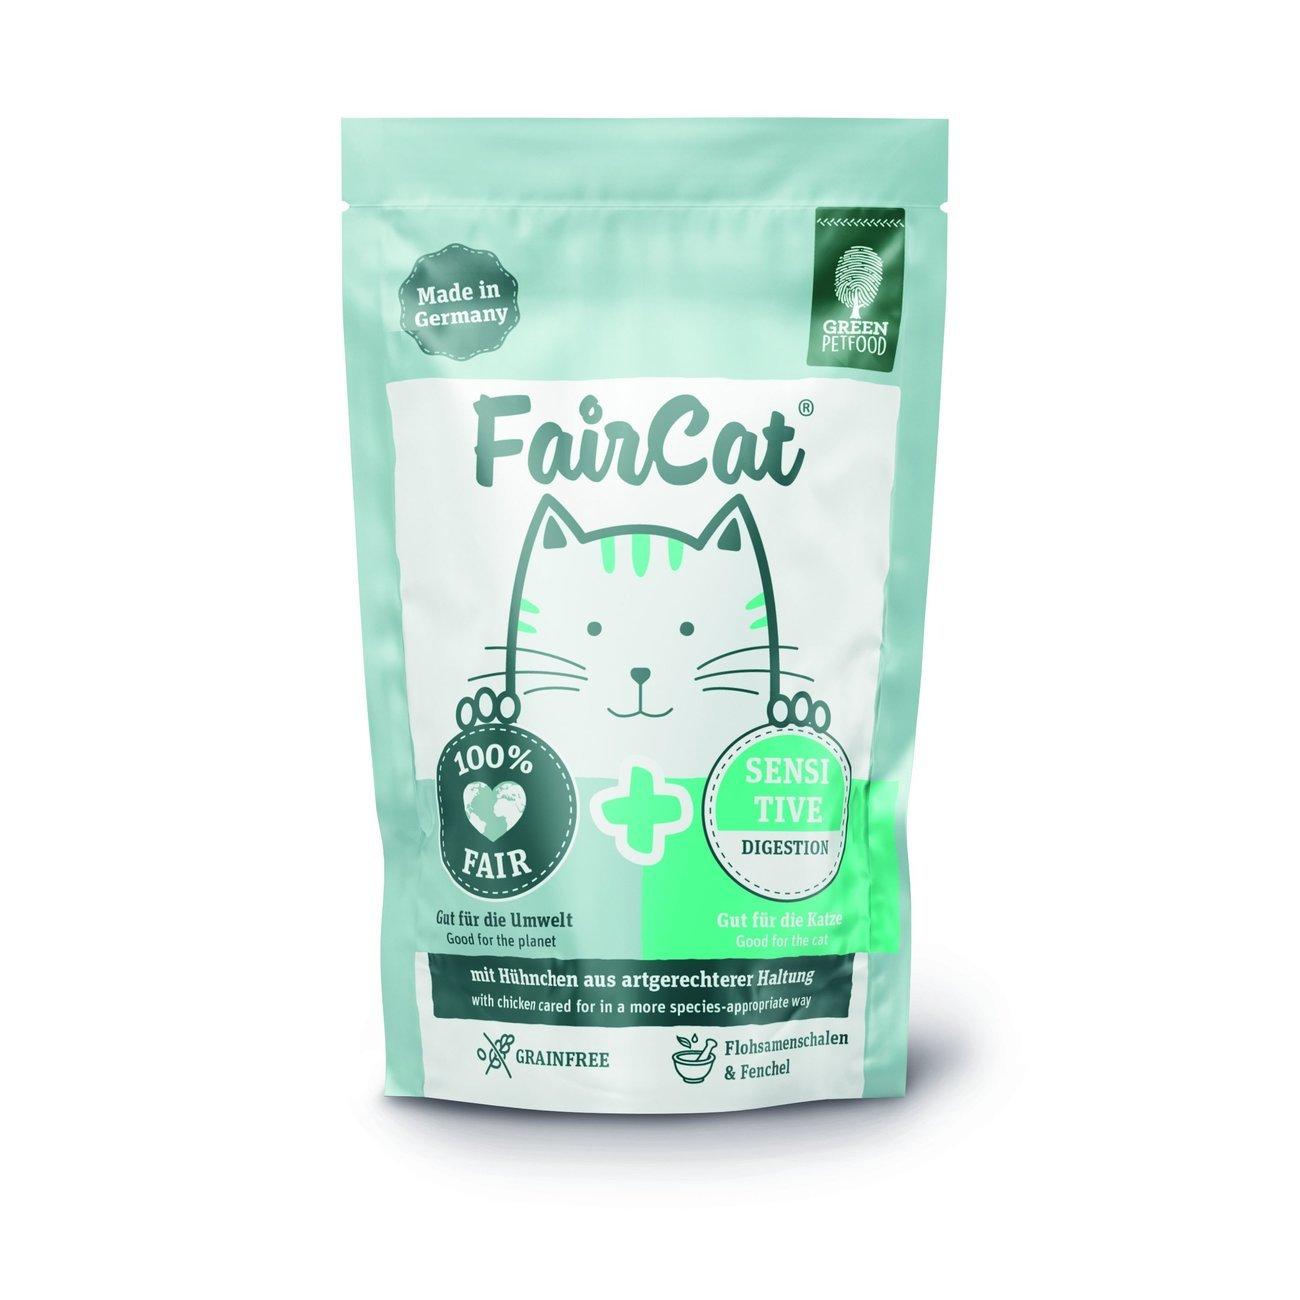 Green Petfood FairCat Sensitive Katzenfutter